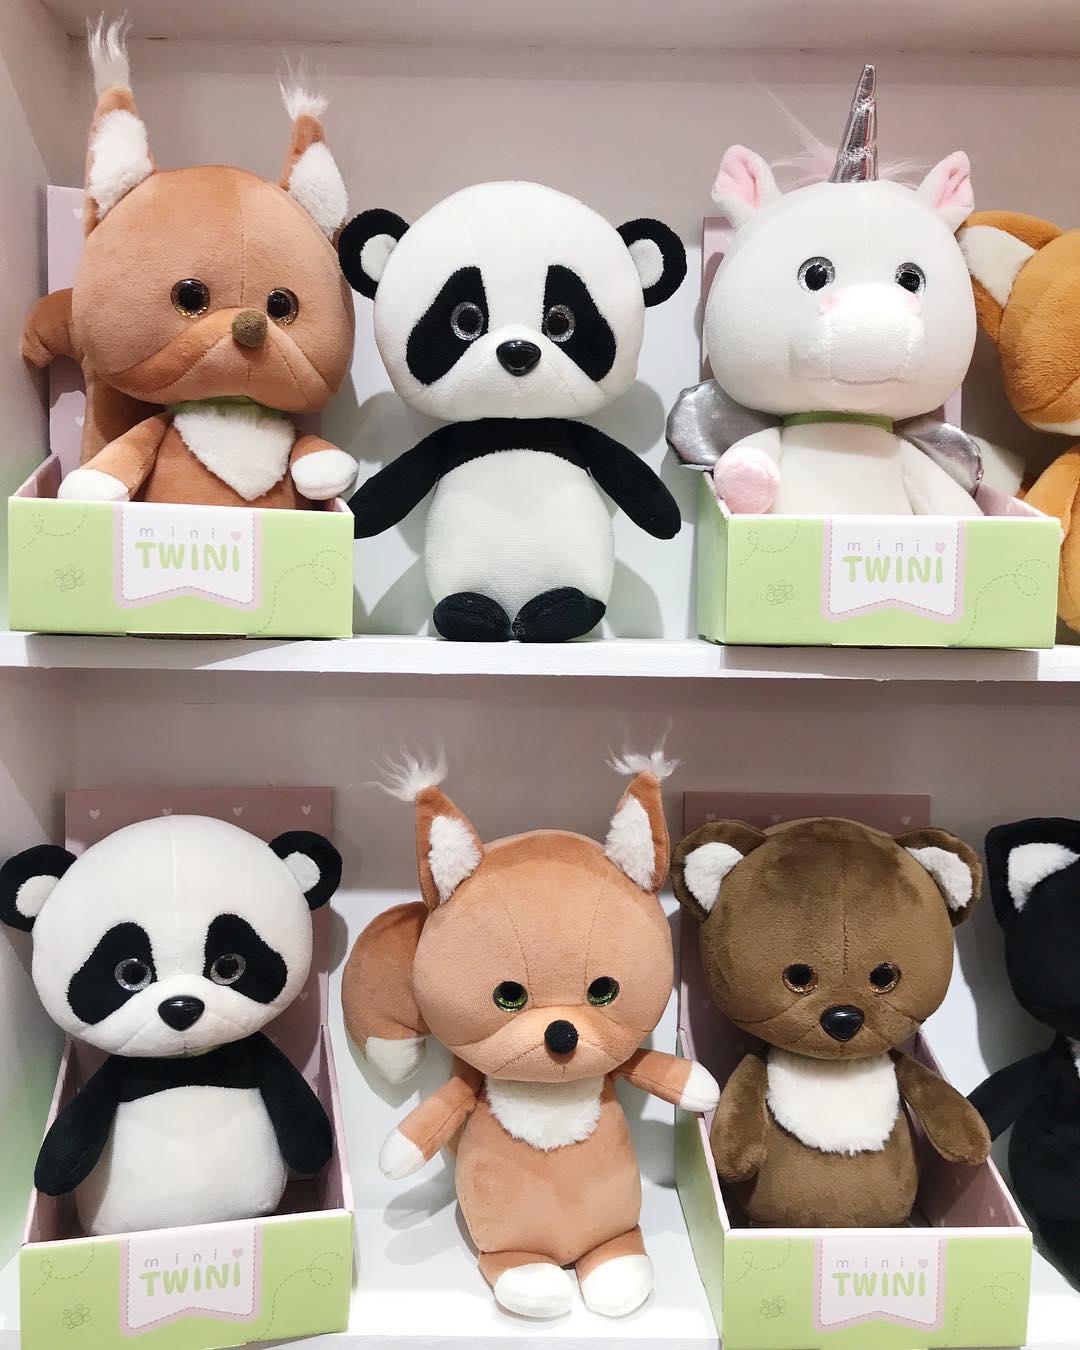 игрушки Mini Twini